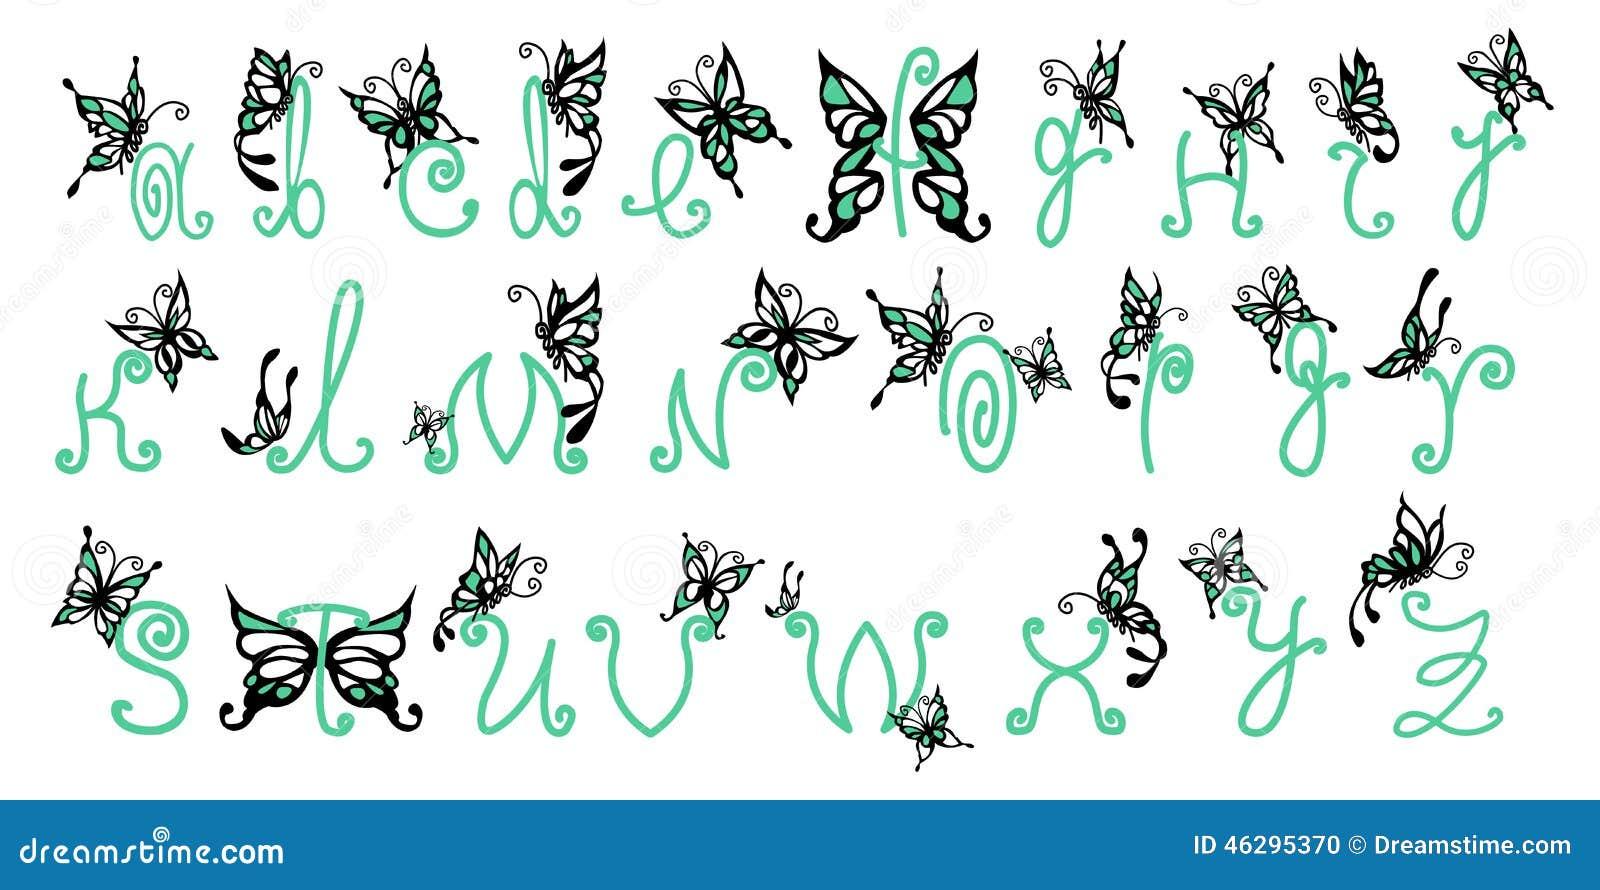 Butterfly Alphabet Stock Illustration. Illustration Of